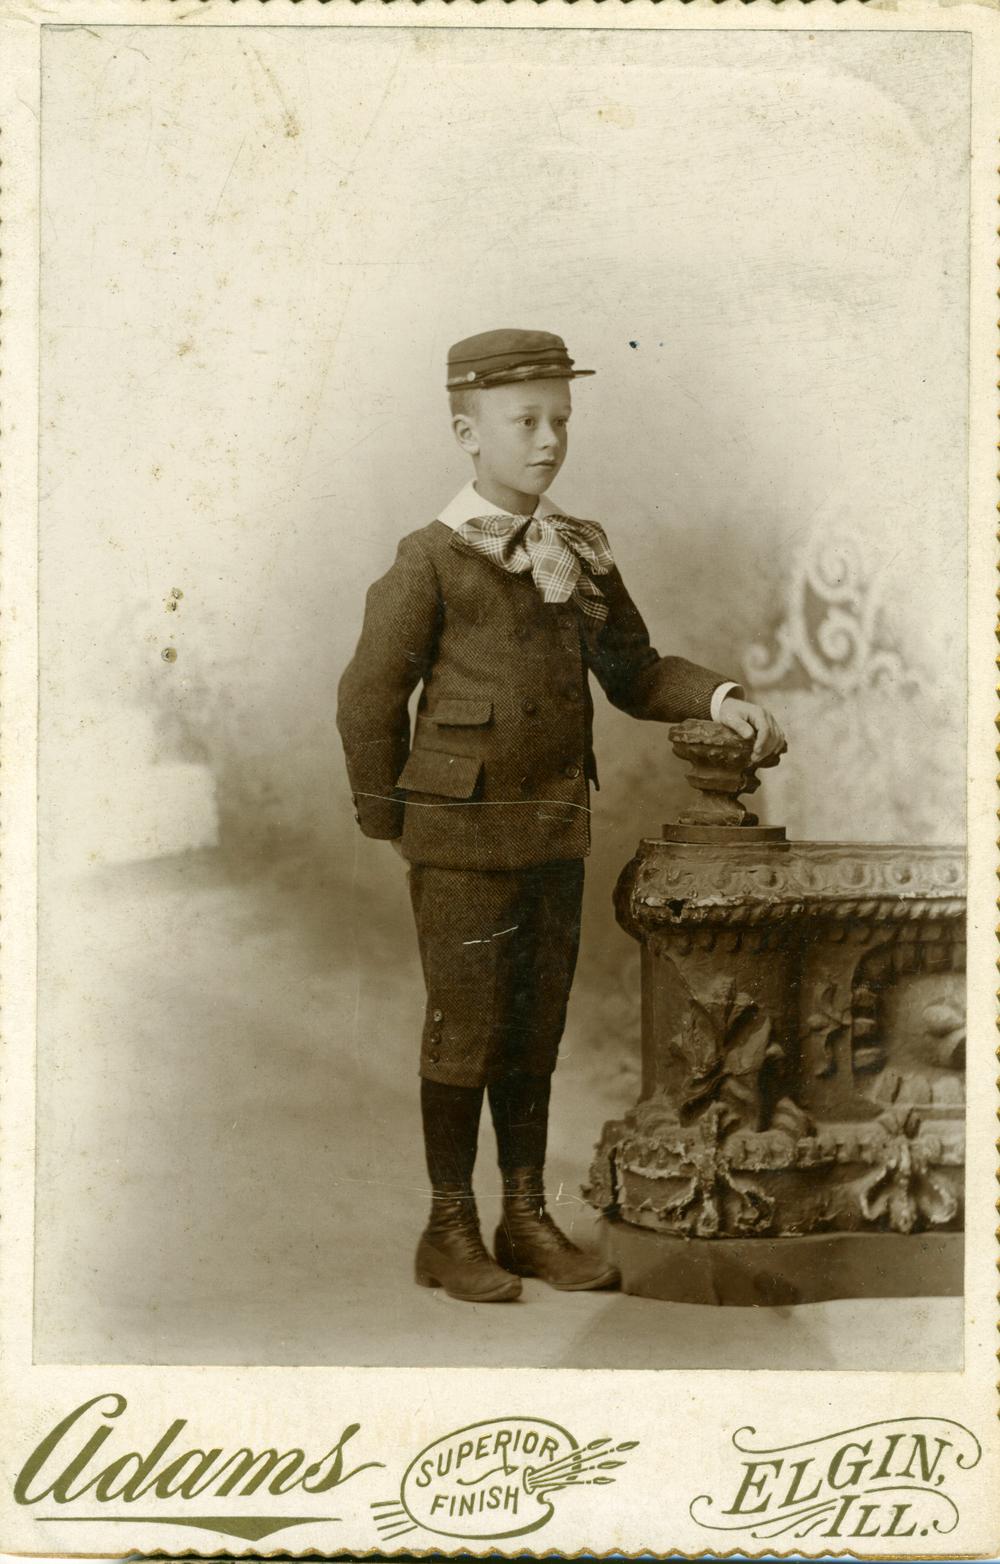 Otis Paul Jenne, age 9